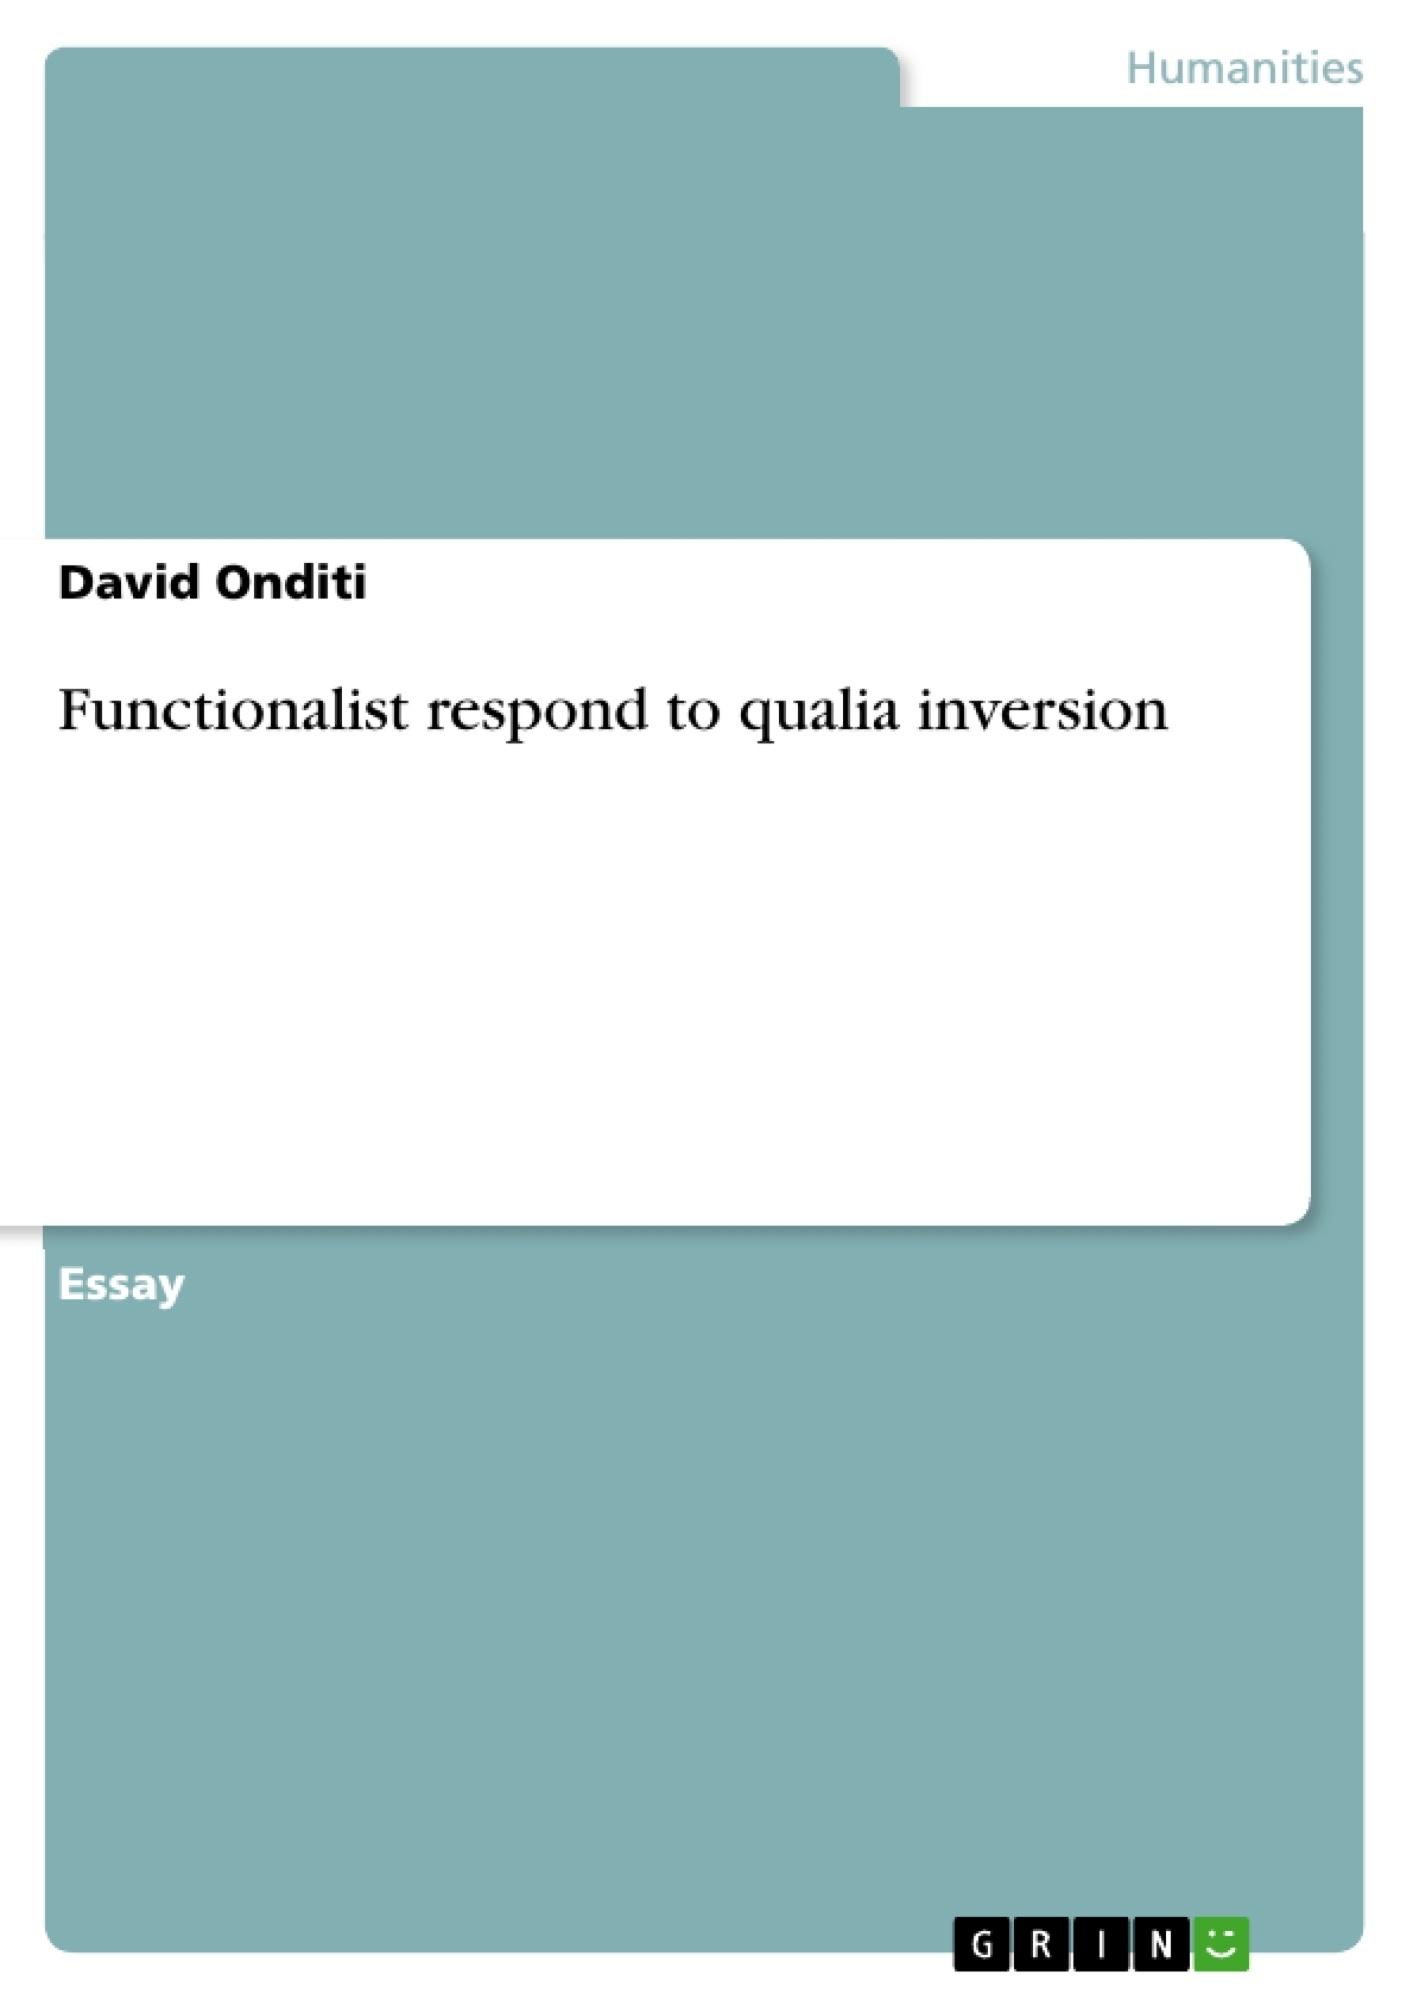 Title: Functionalist respond to qualia inversion